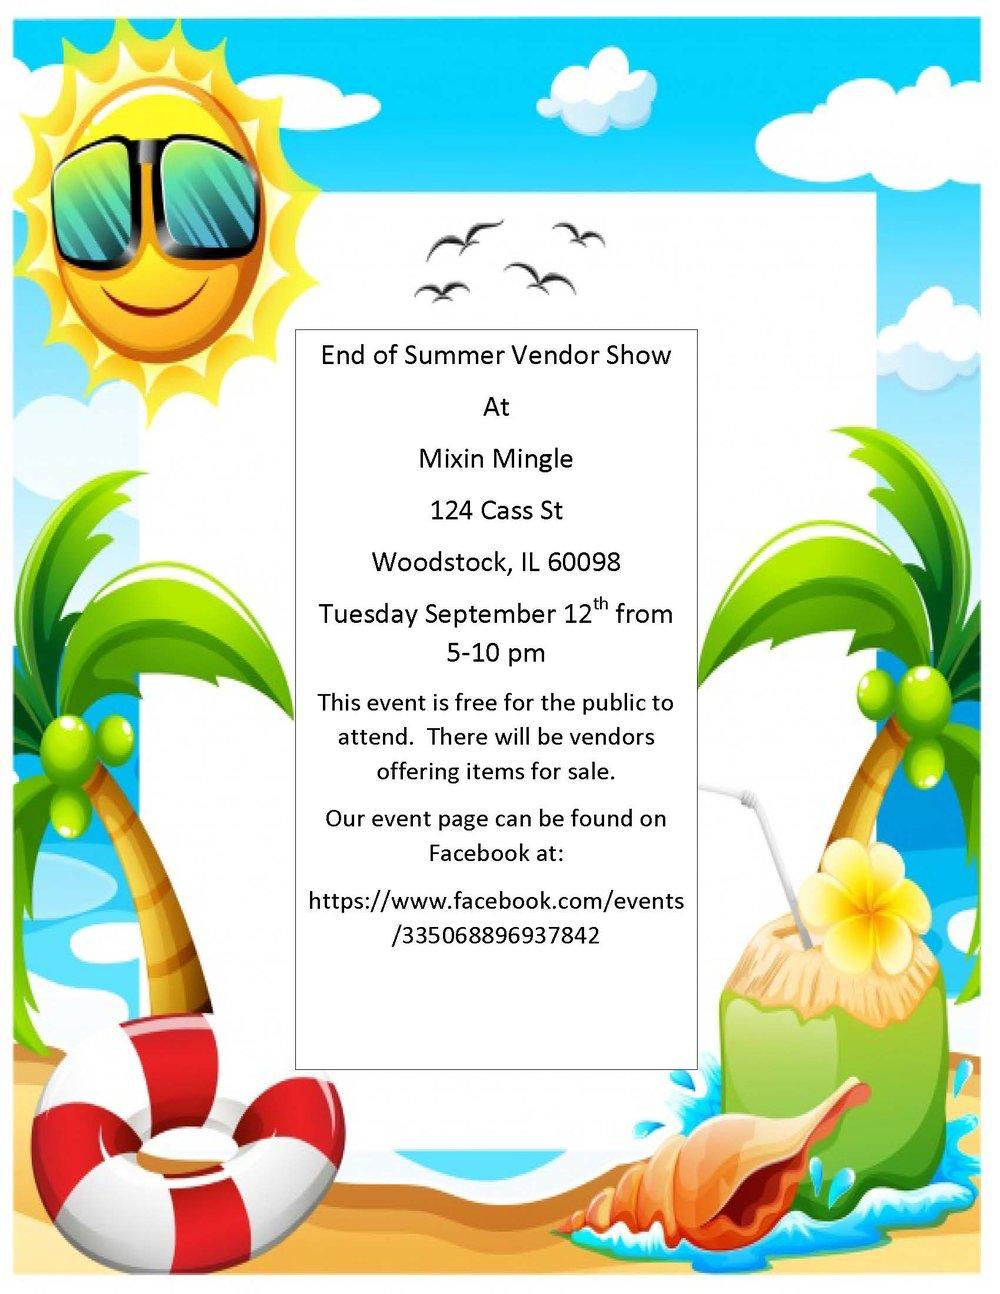 End of Summer Event Flyer.jpg